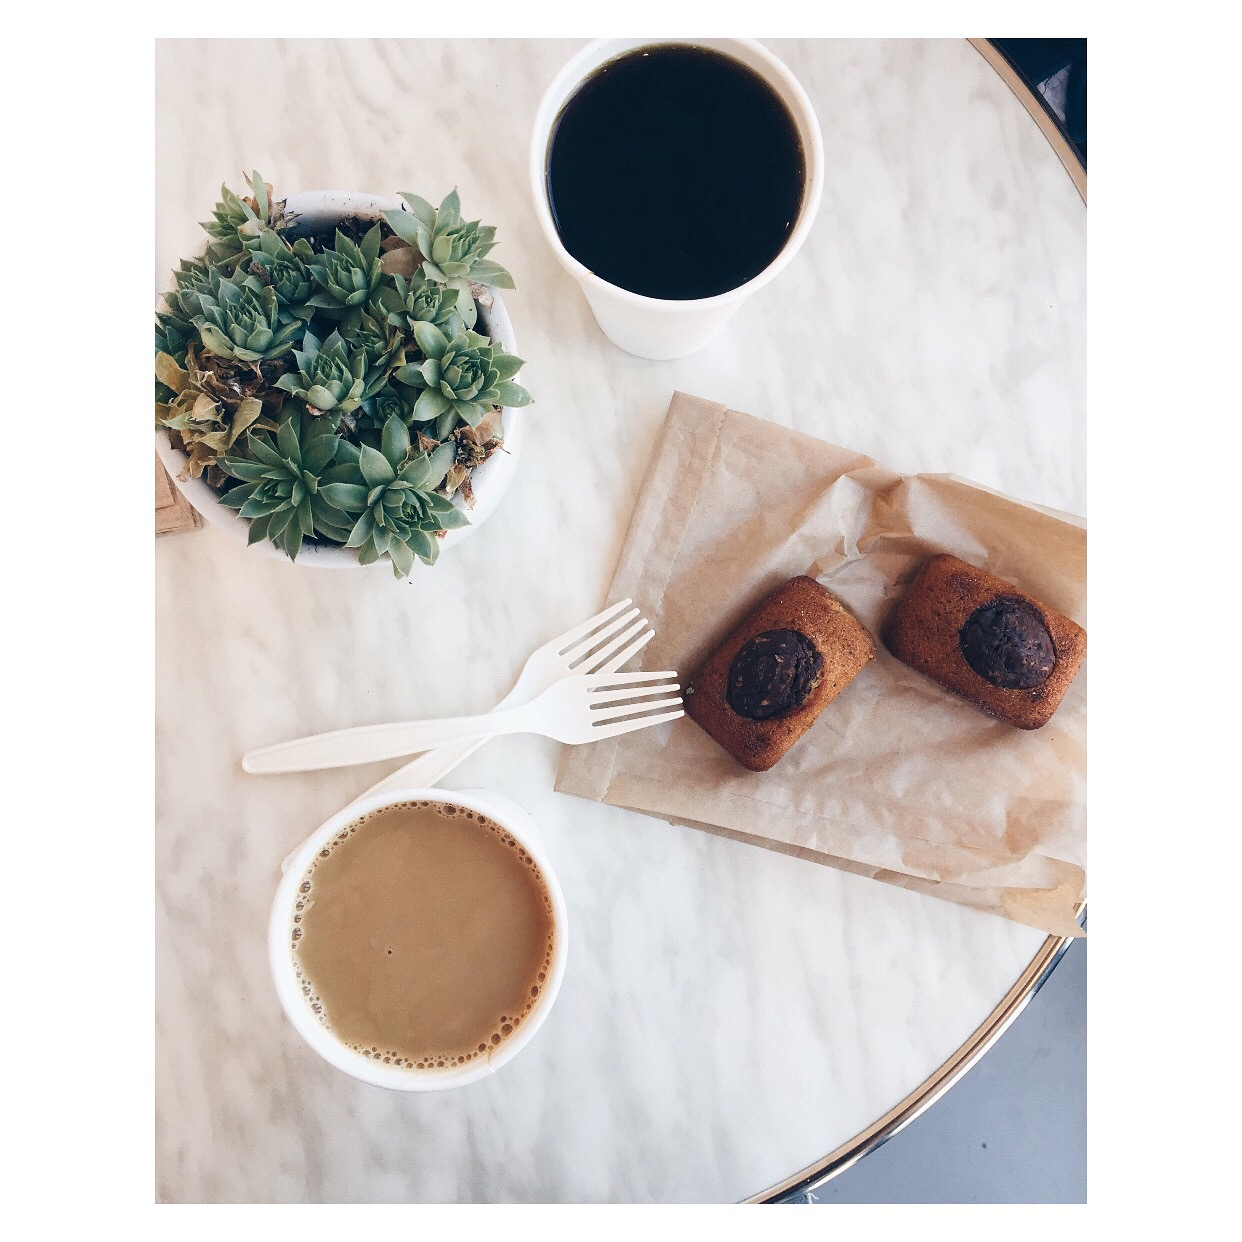 Coffee and Financiers in San Francisco